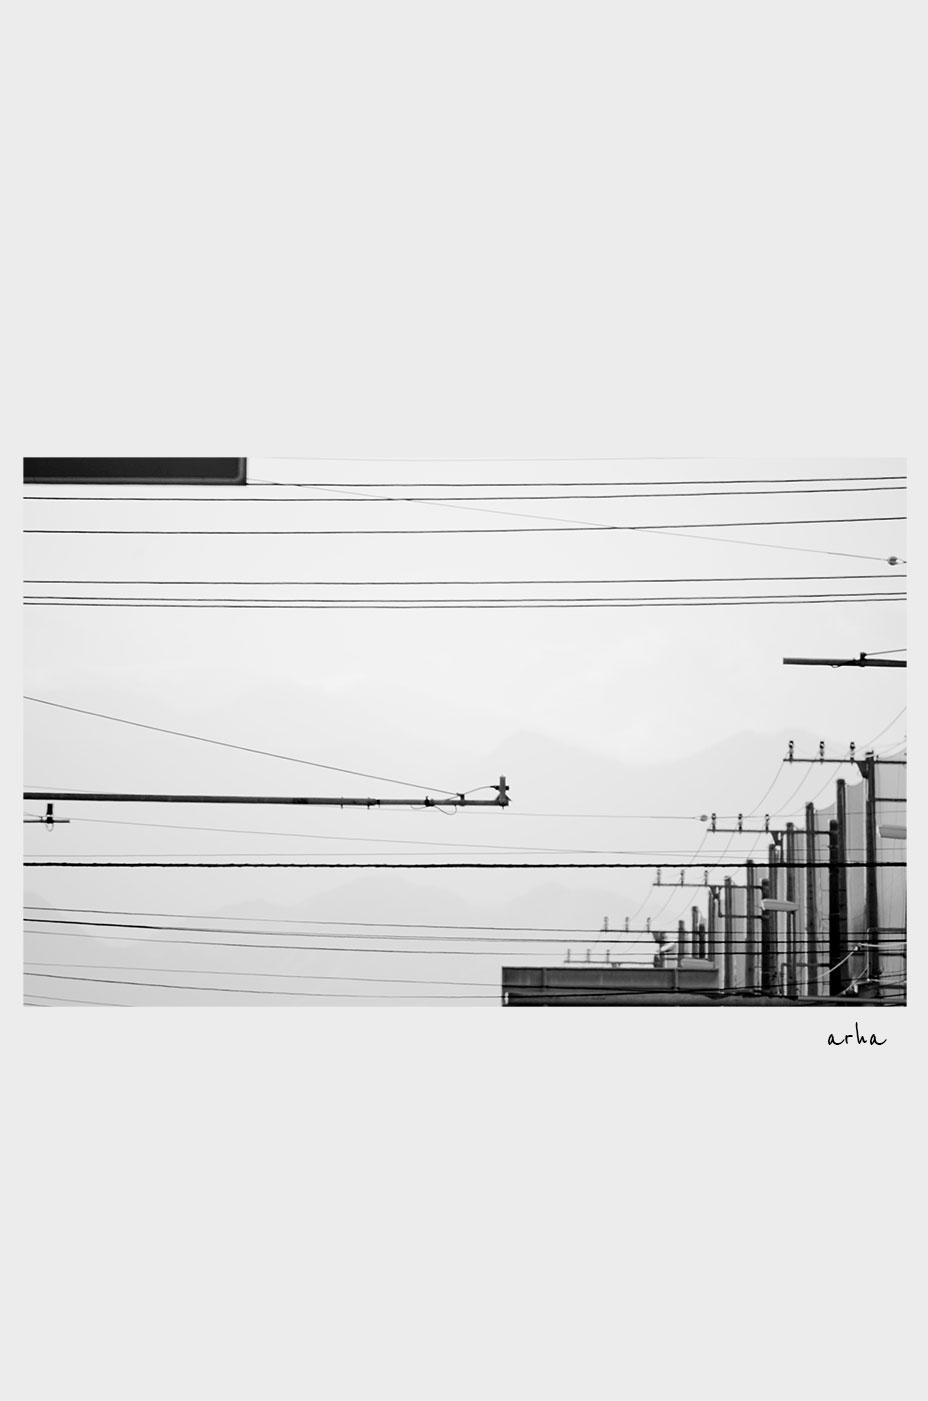 Contest-of-the-noise-copyright-2012-arha-Tomomichi-Morifuji